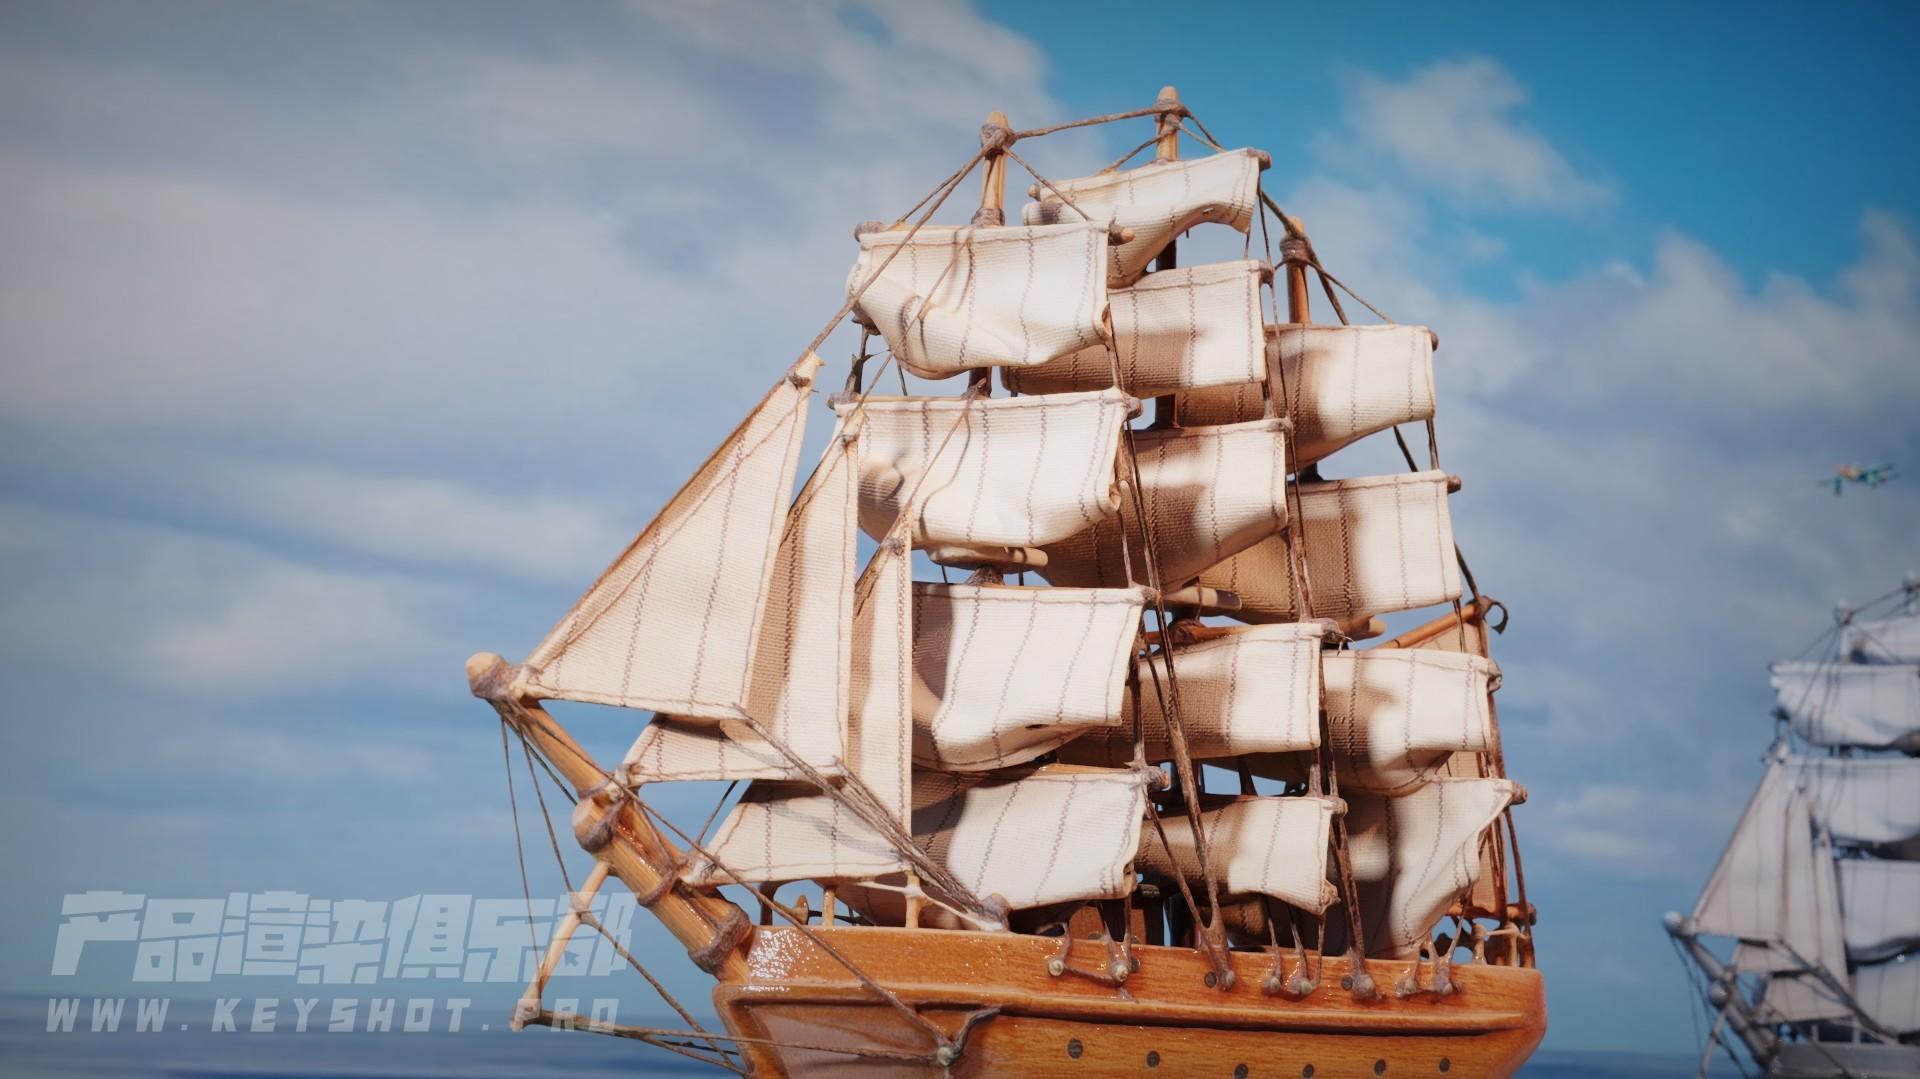 《竞争吧!帆船》/ Keyshot